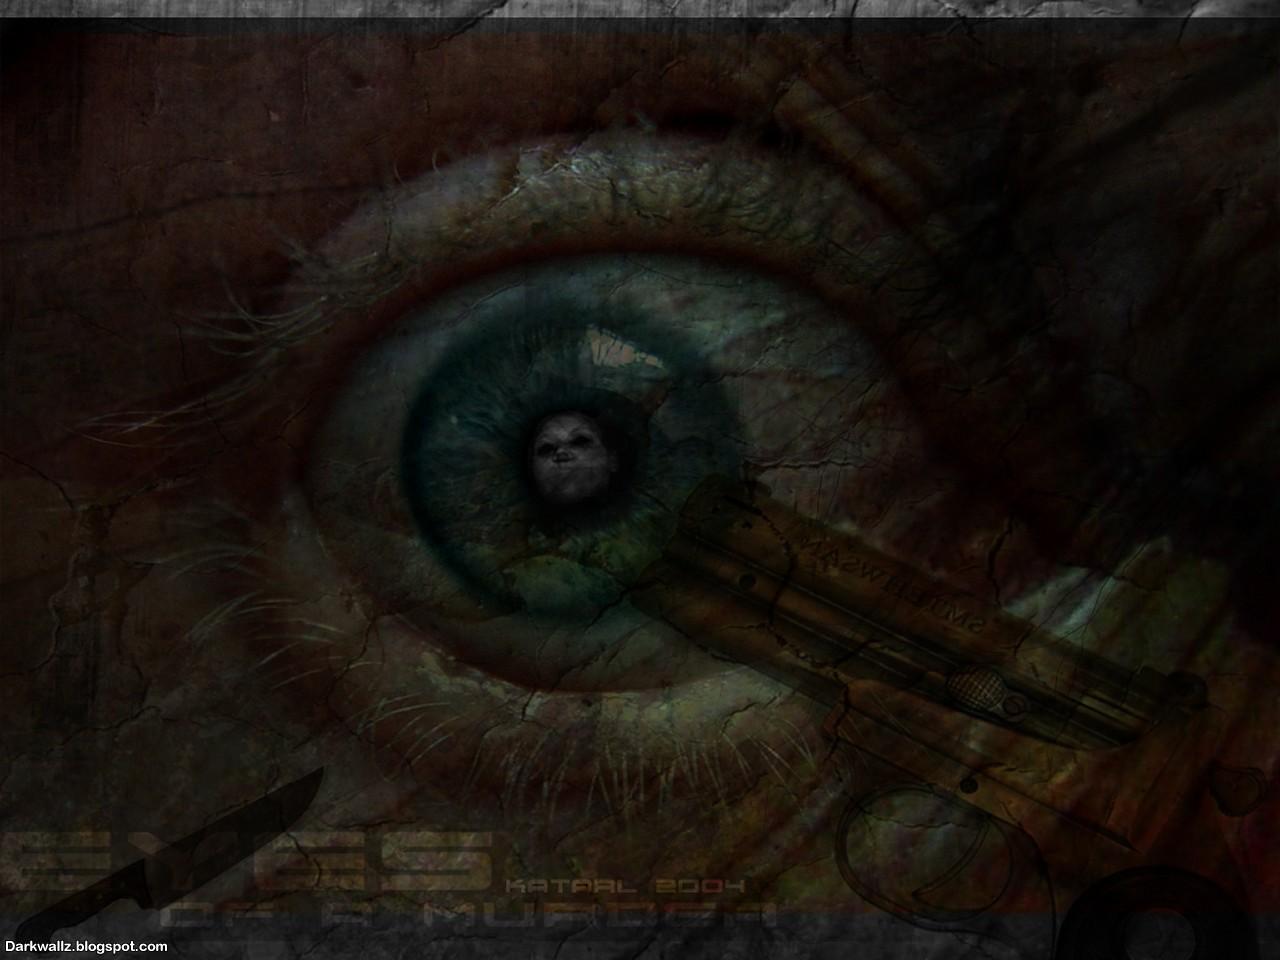 Scary Eyes Wallpapers 16 | Dark Wallpaper Download